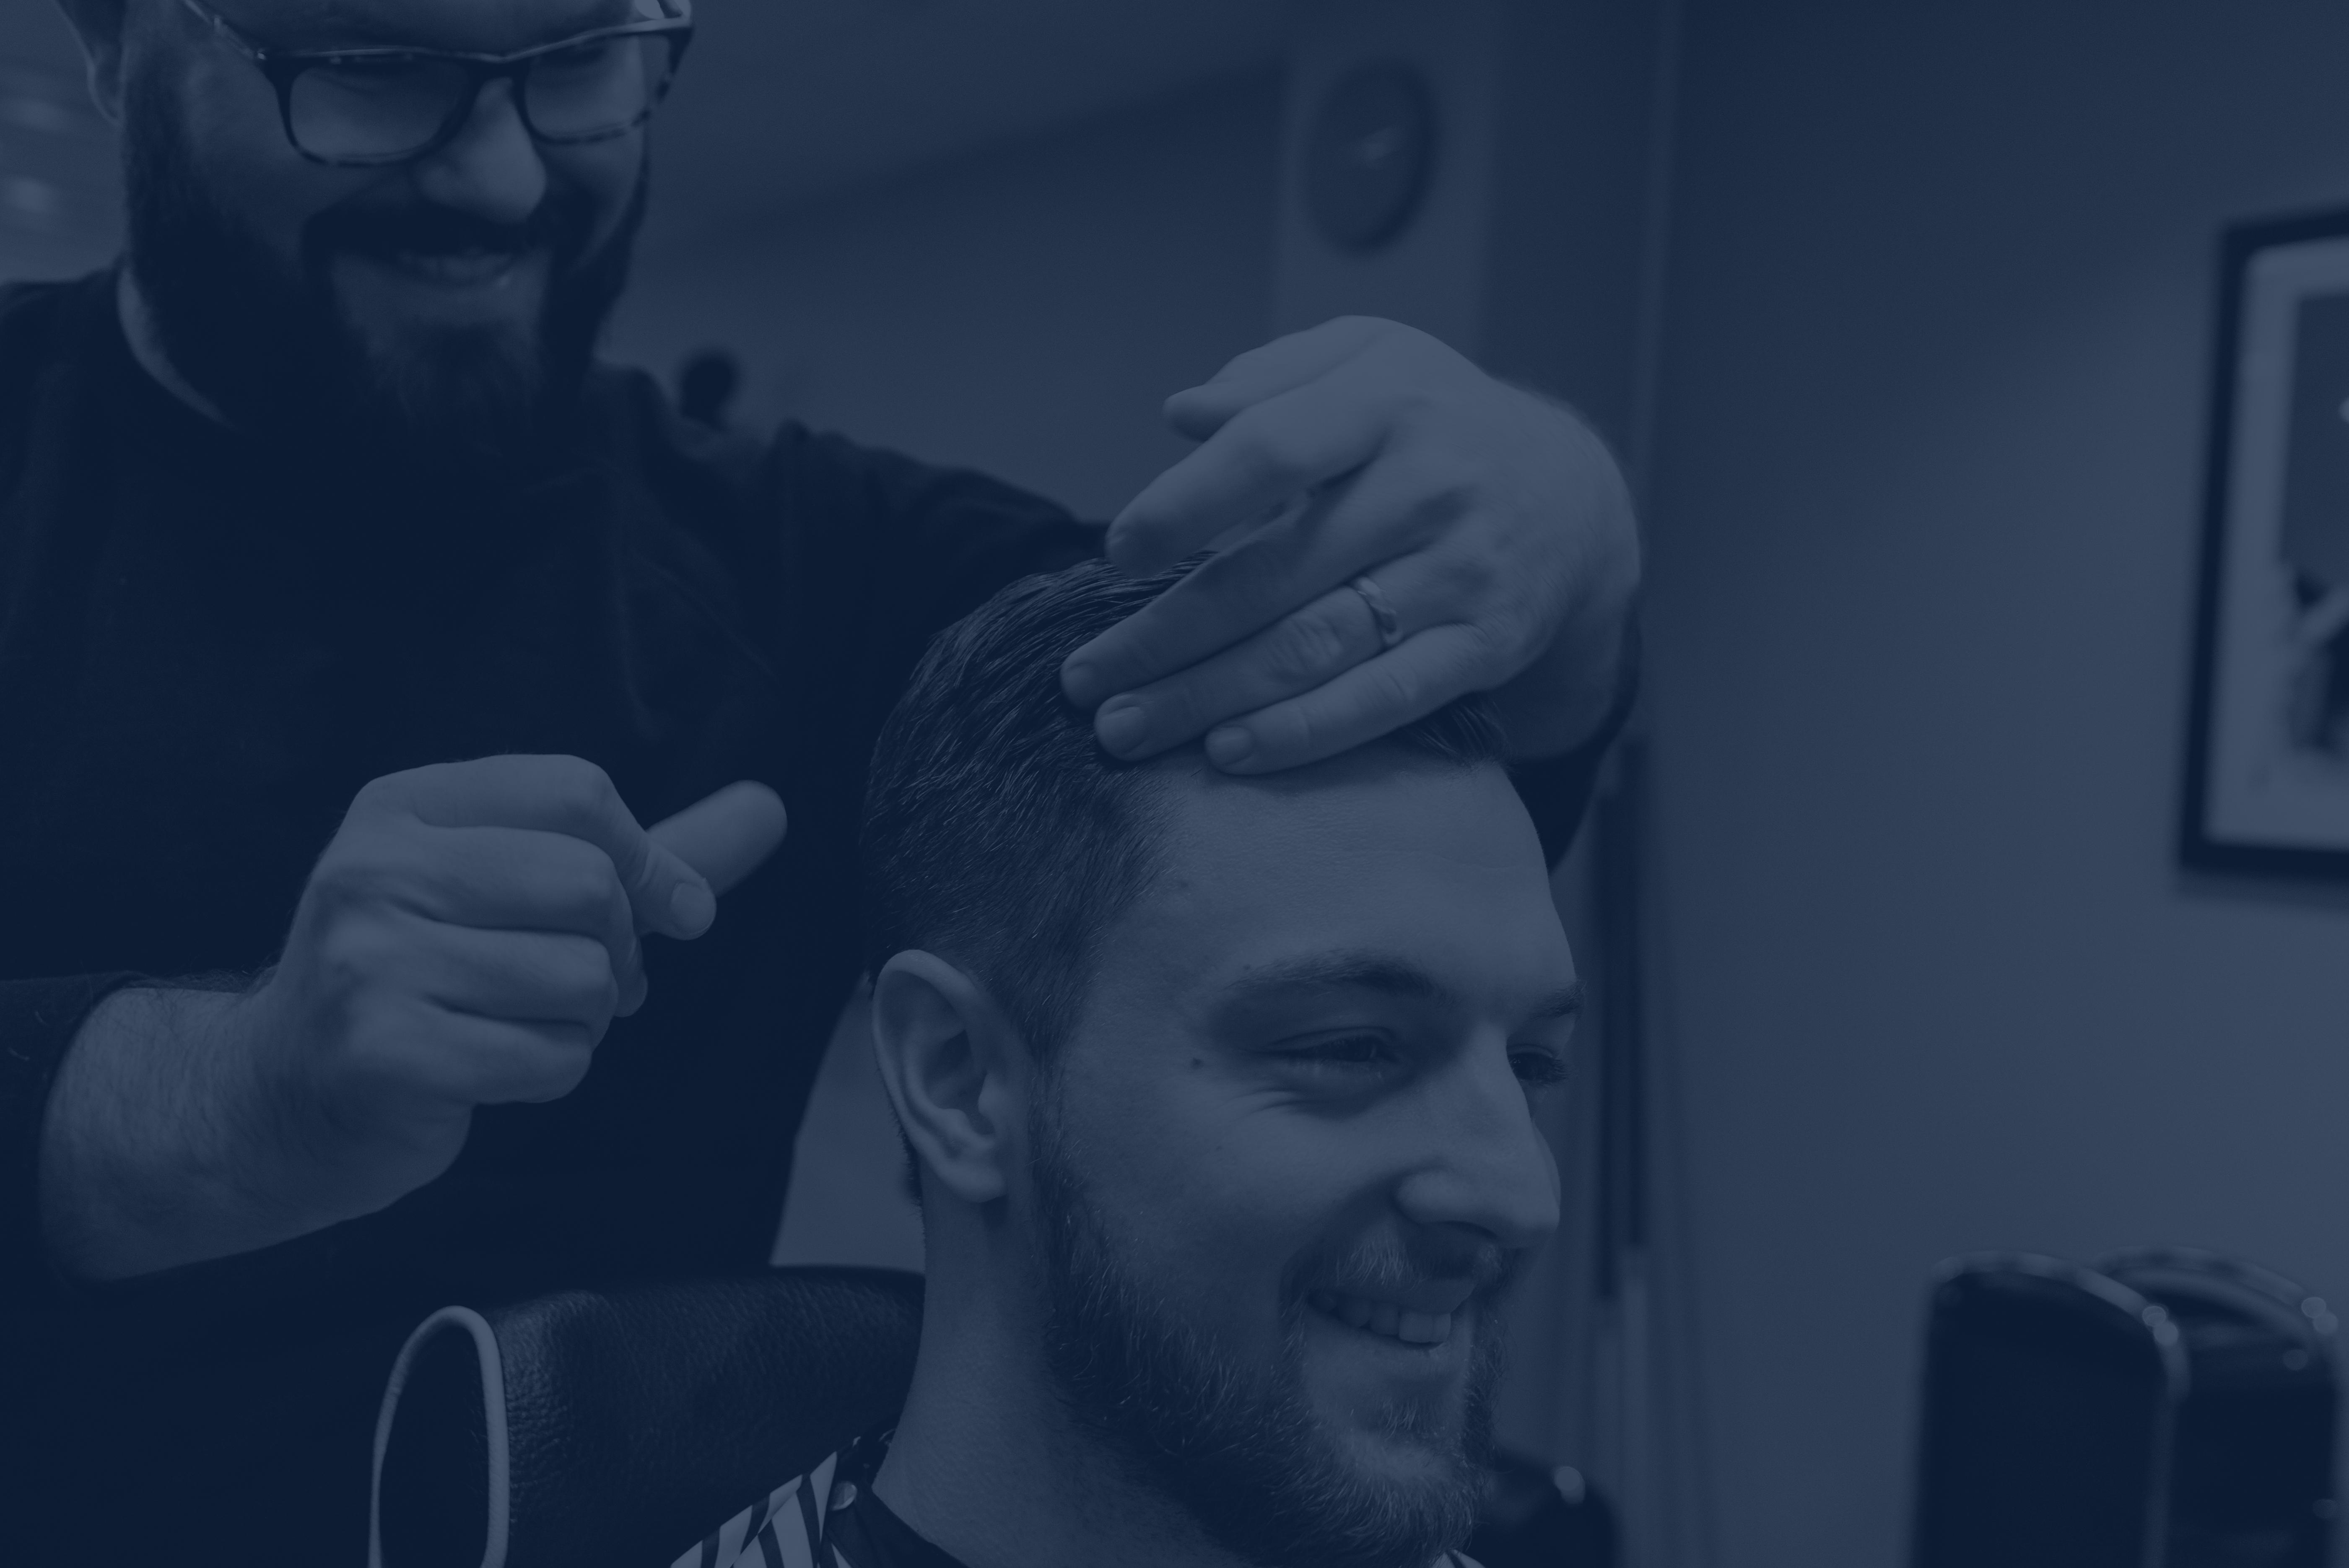 Din frisör i bromma